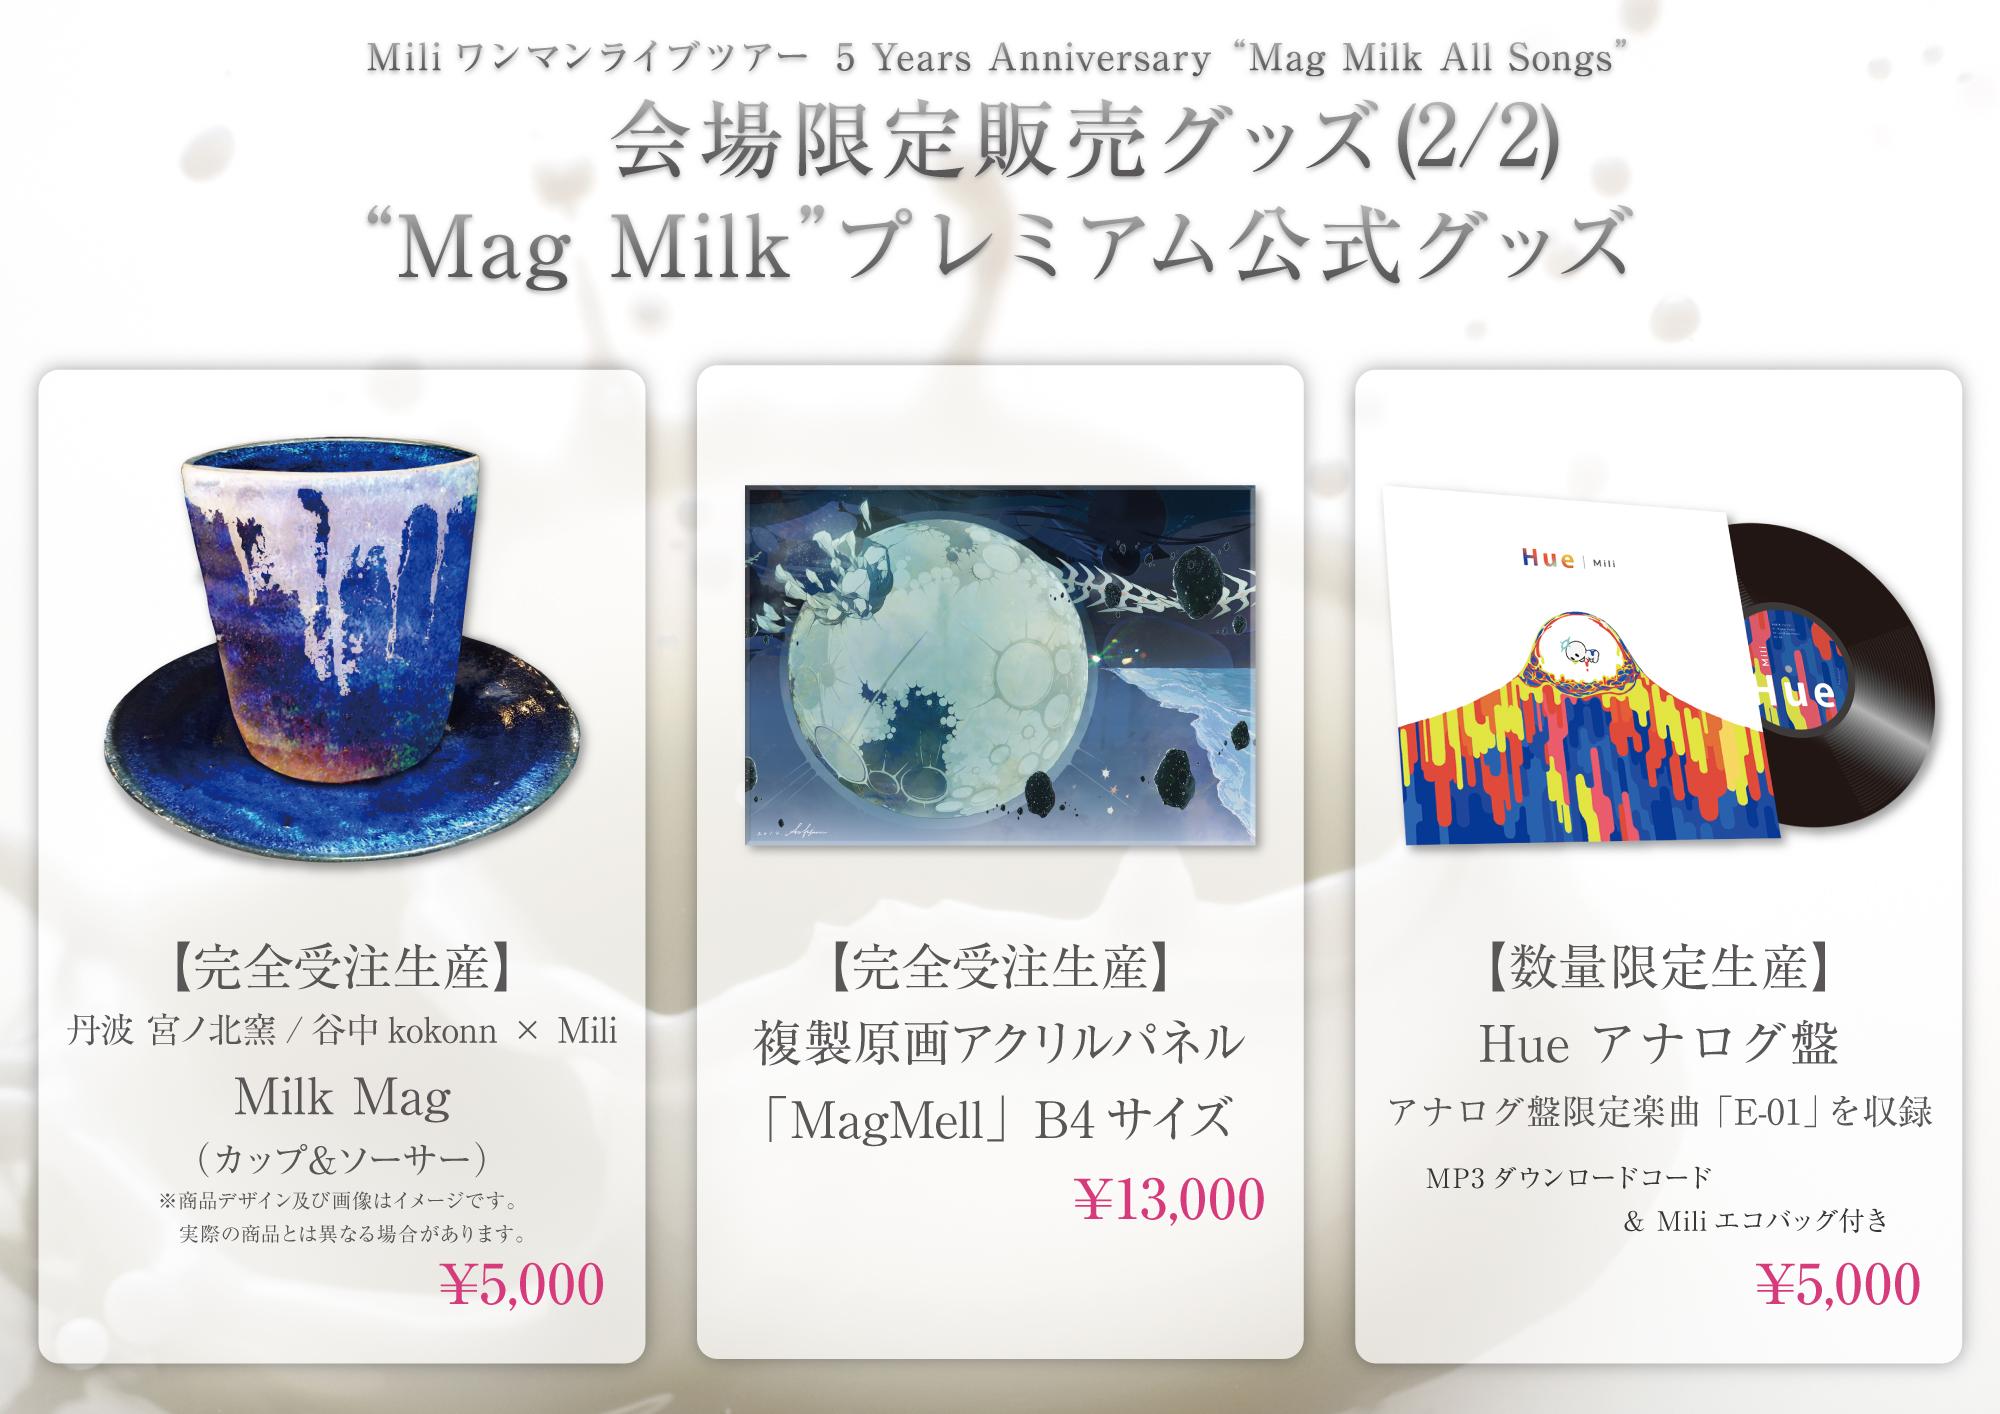 Mili-MagMilkお品書き-1-2-価格なし-2000.jpg